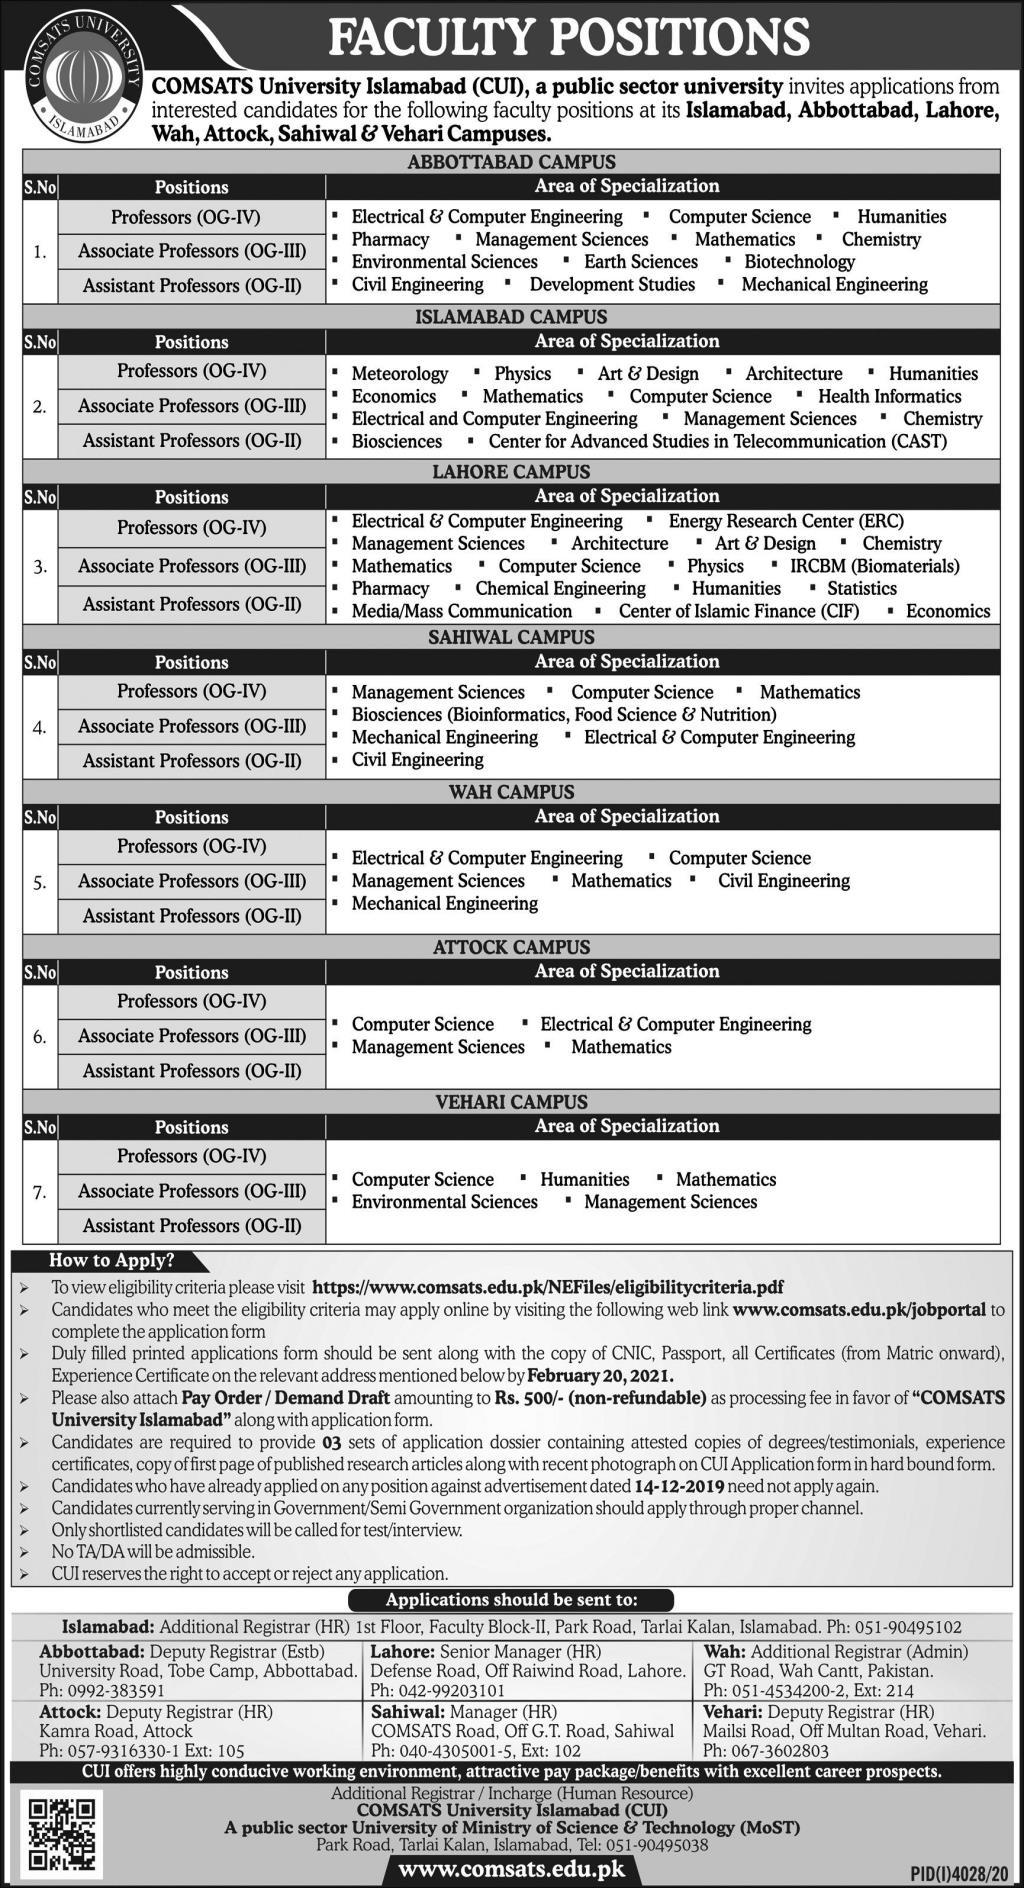 Comsats Careers - Comsats University Jobs - Comsats University Islamabad (CUI) Jobs 2021 - Lecturer Jobs - Academic Positions - Academic Jobs - Online Apply - ww2.comsats.edu.pk/jobportal/Login.aspx